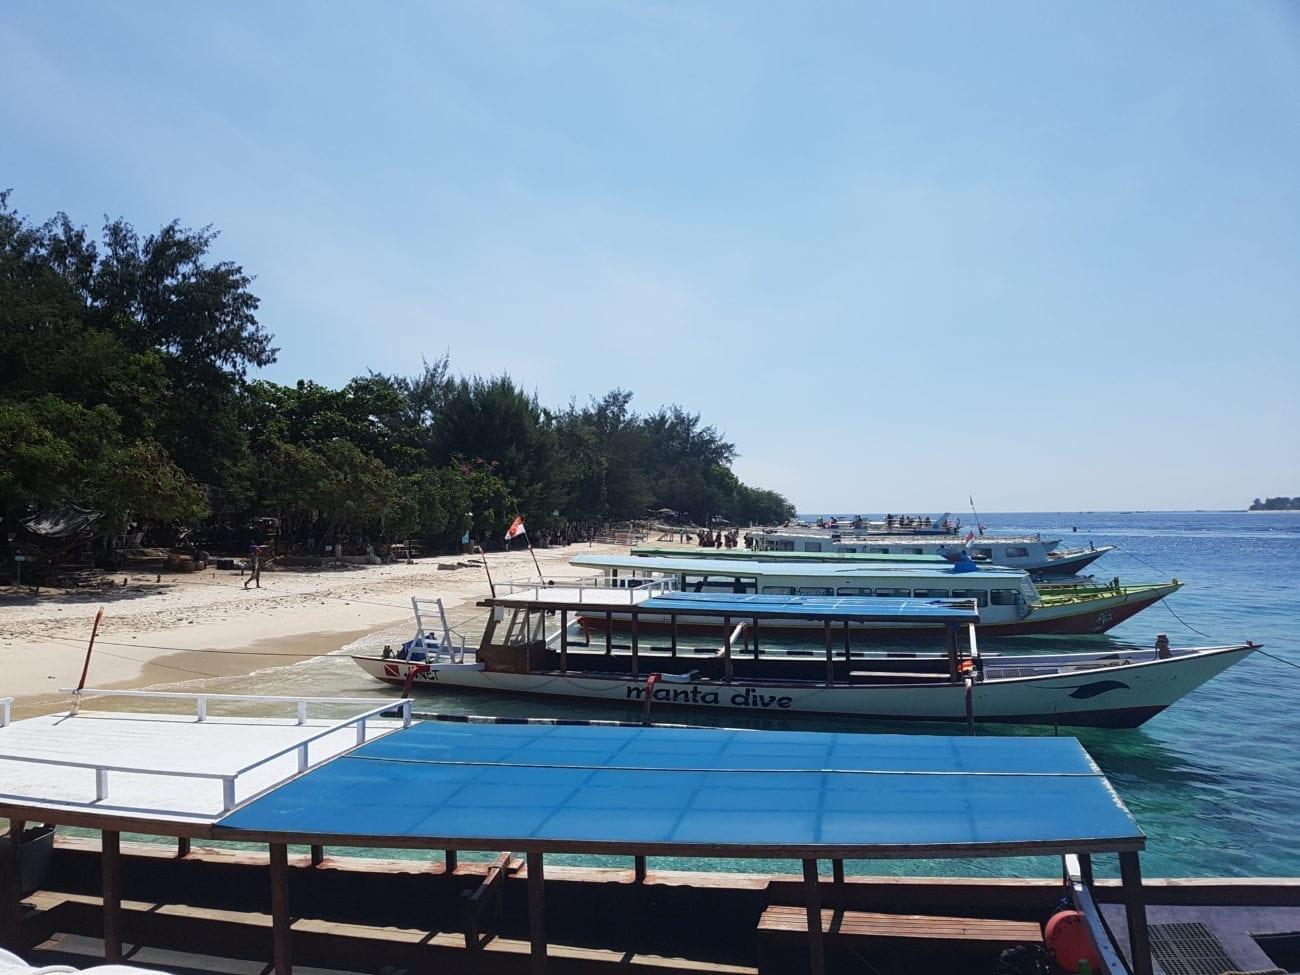 prachtige stranden op Gili trawangan